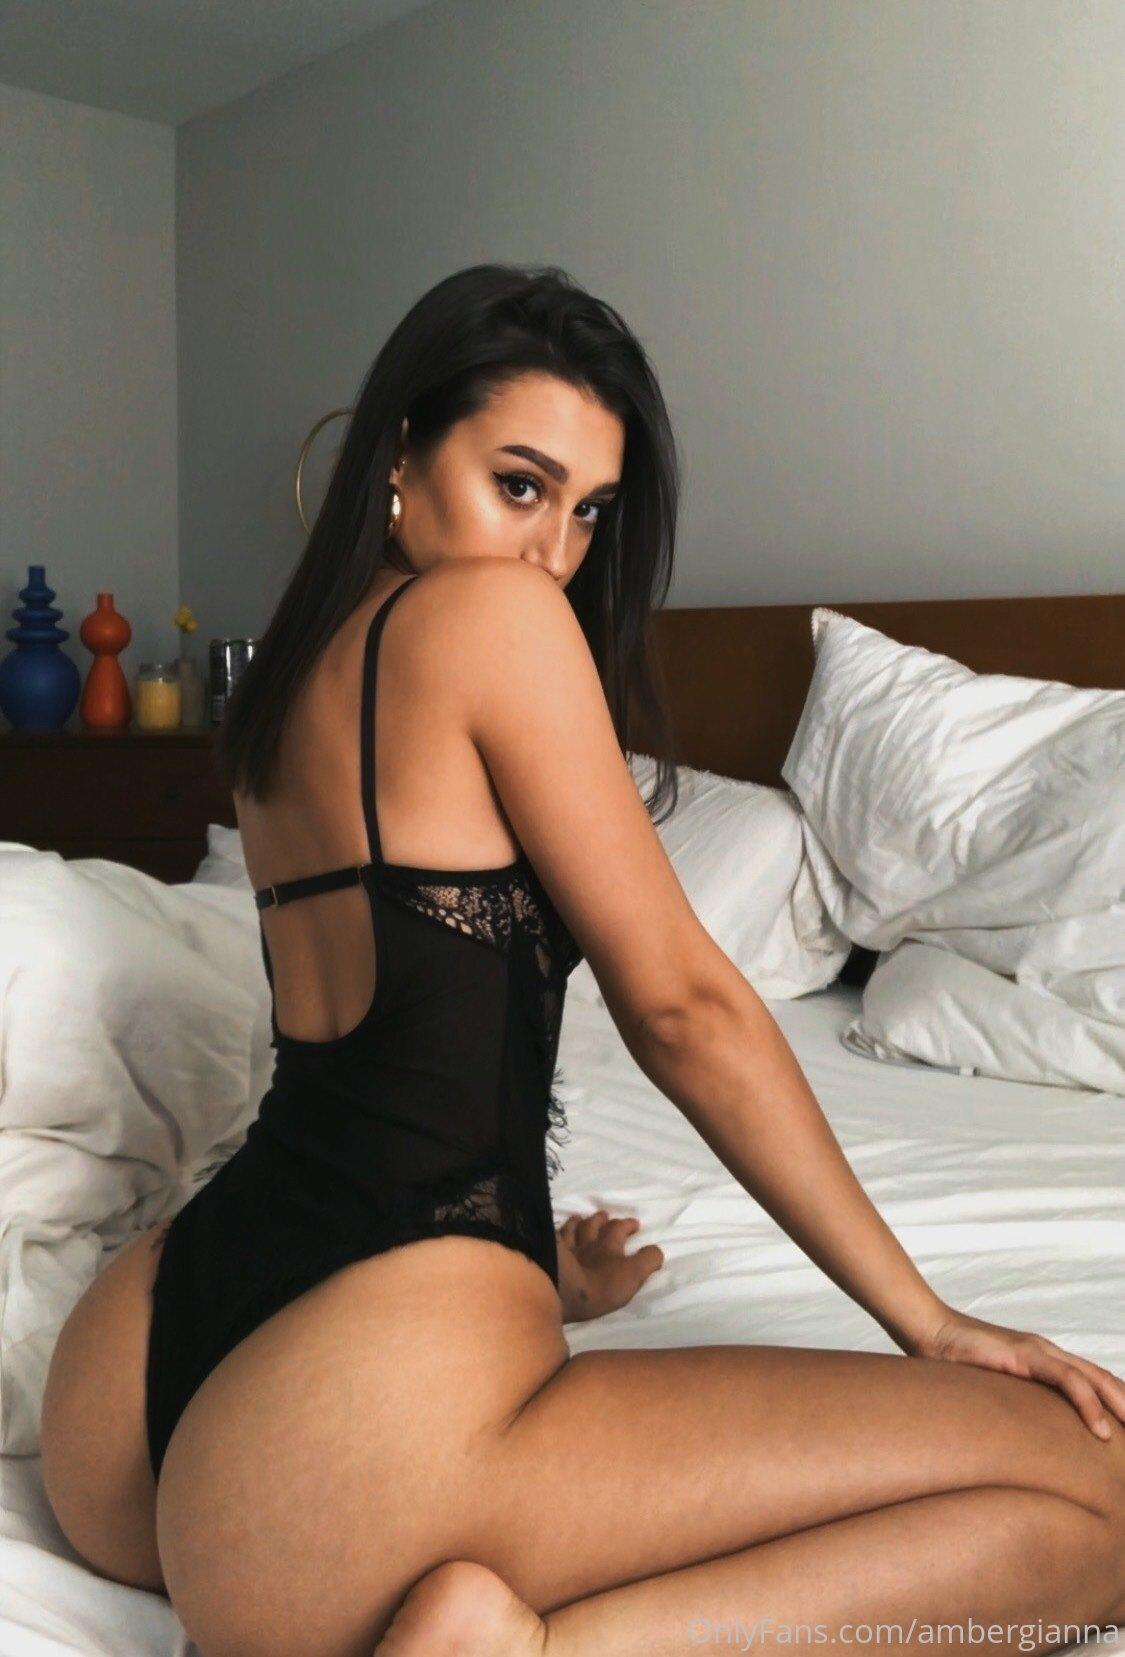 Amber Gianna Onlyfans 0061